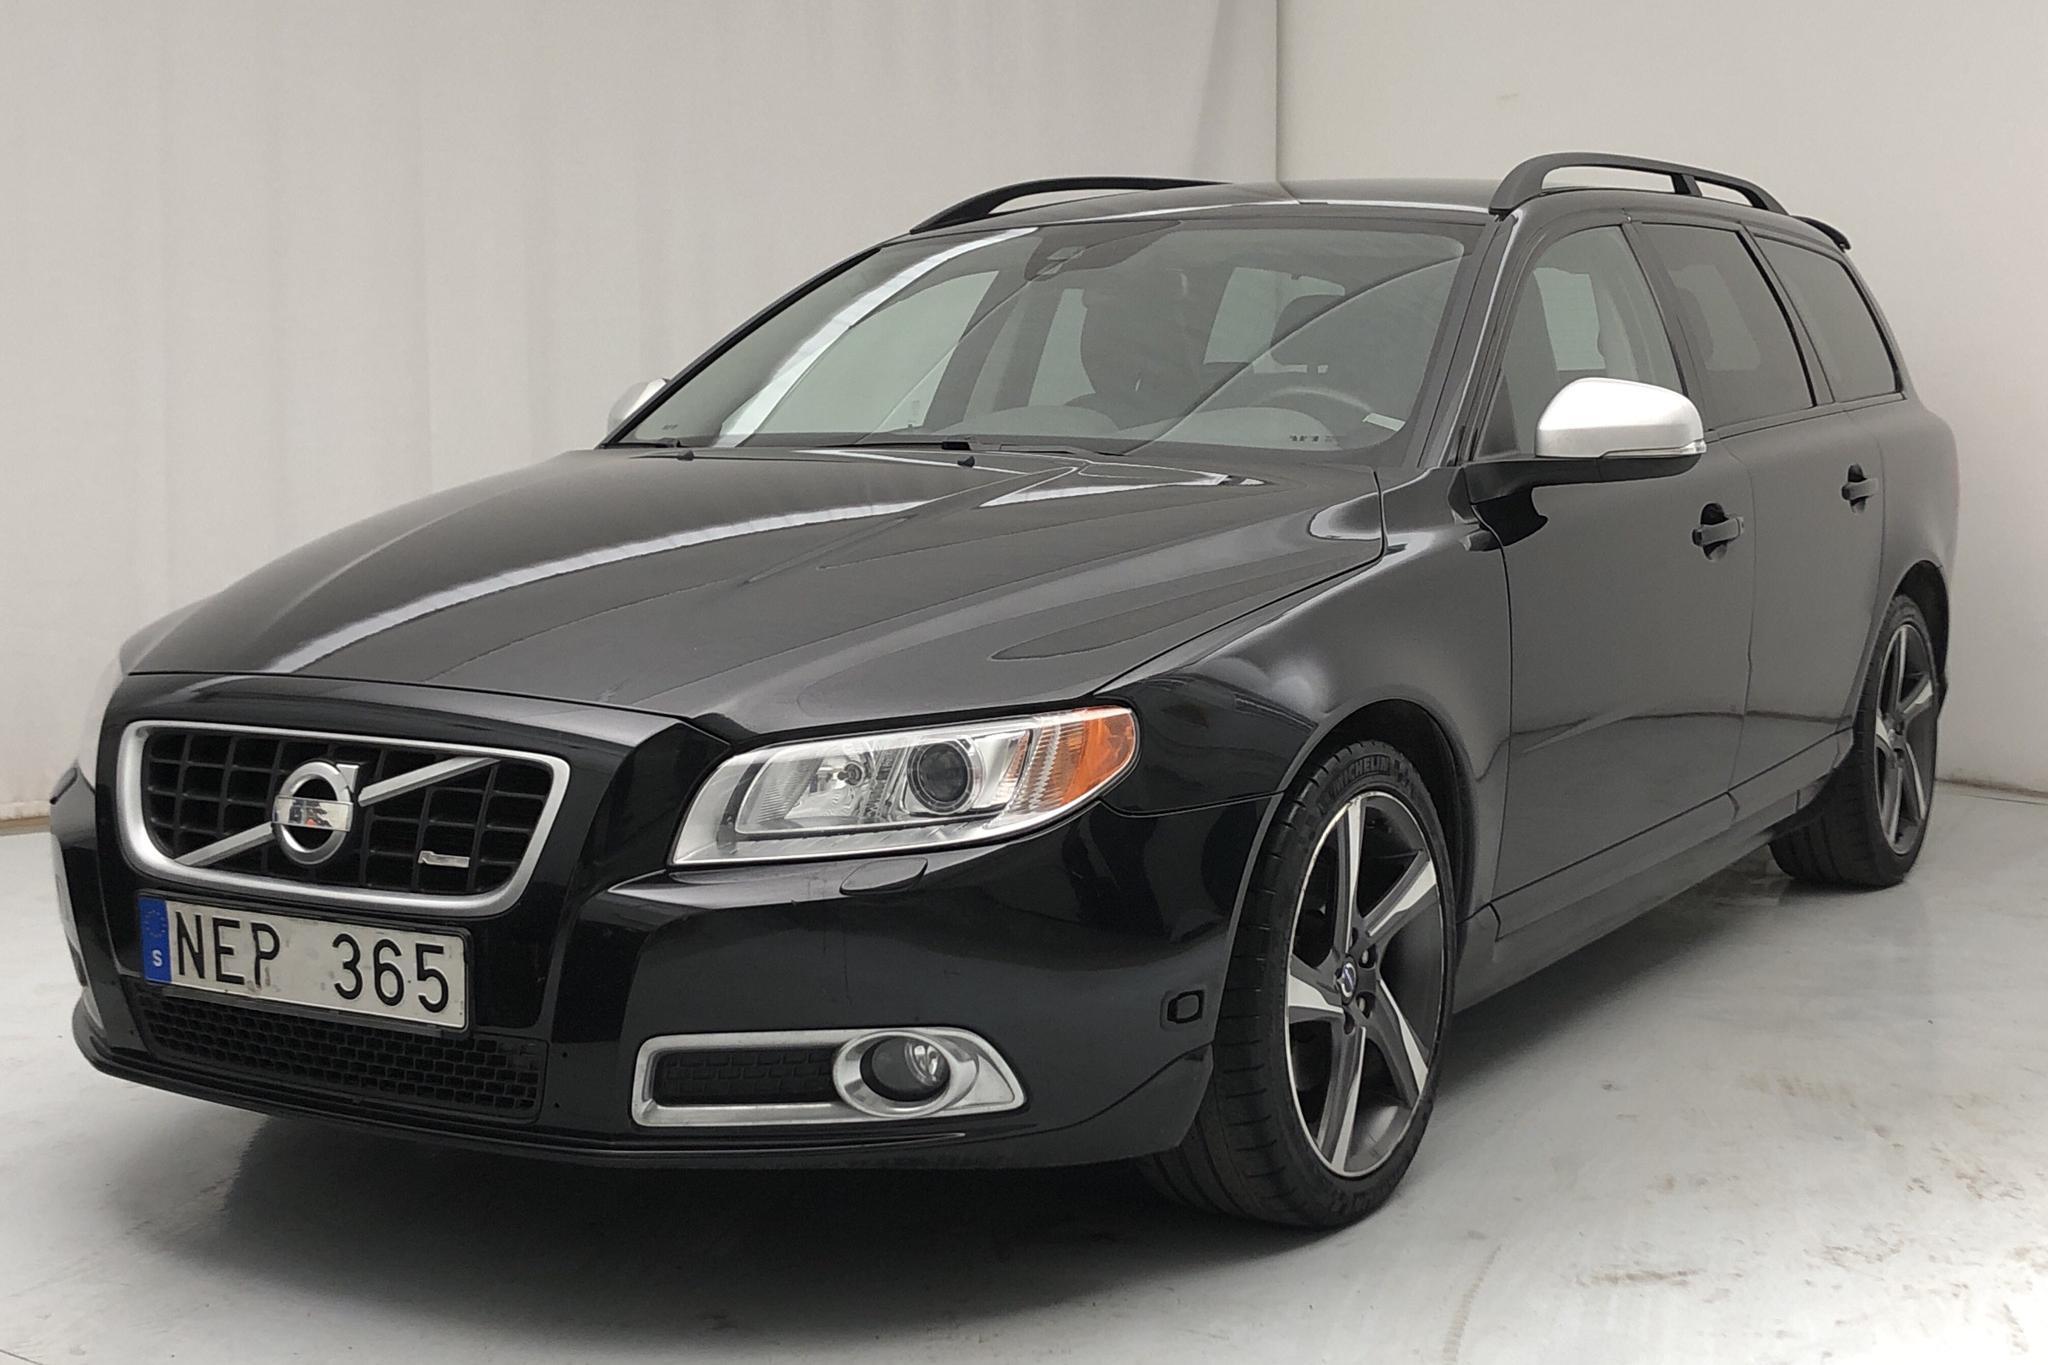 Volvo V70 II T4F (180hk) - 119 300 km - Automatic - black - 2013